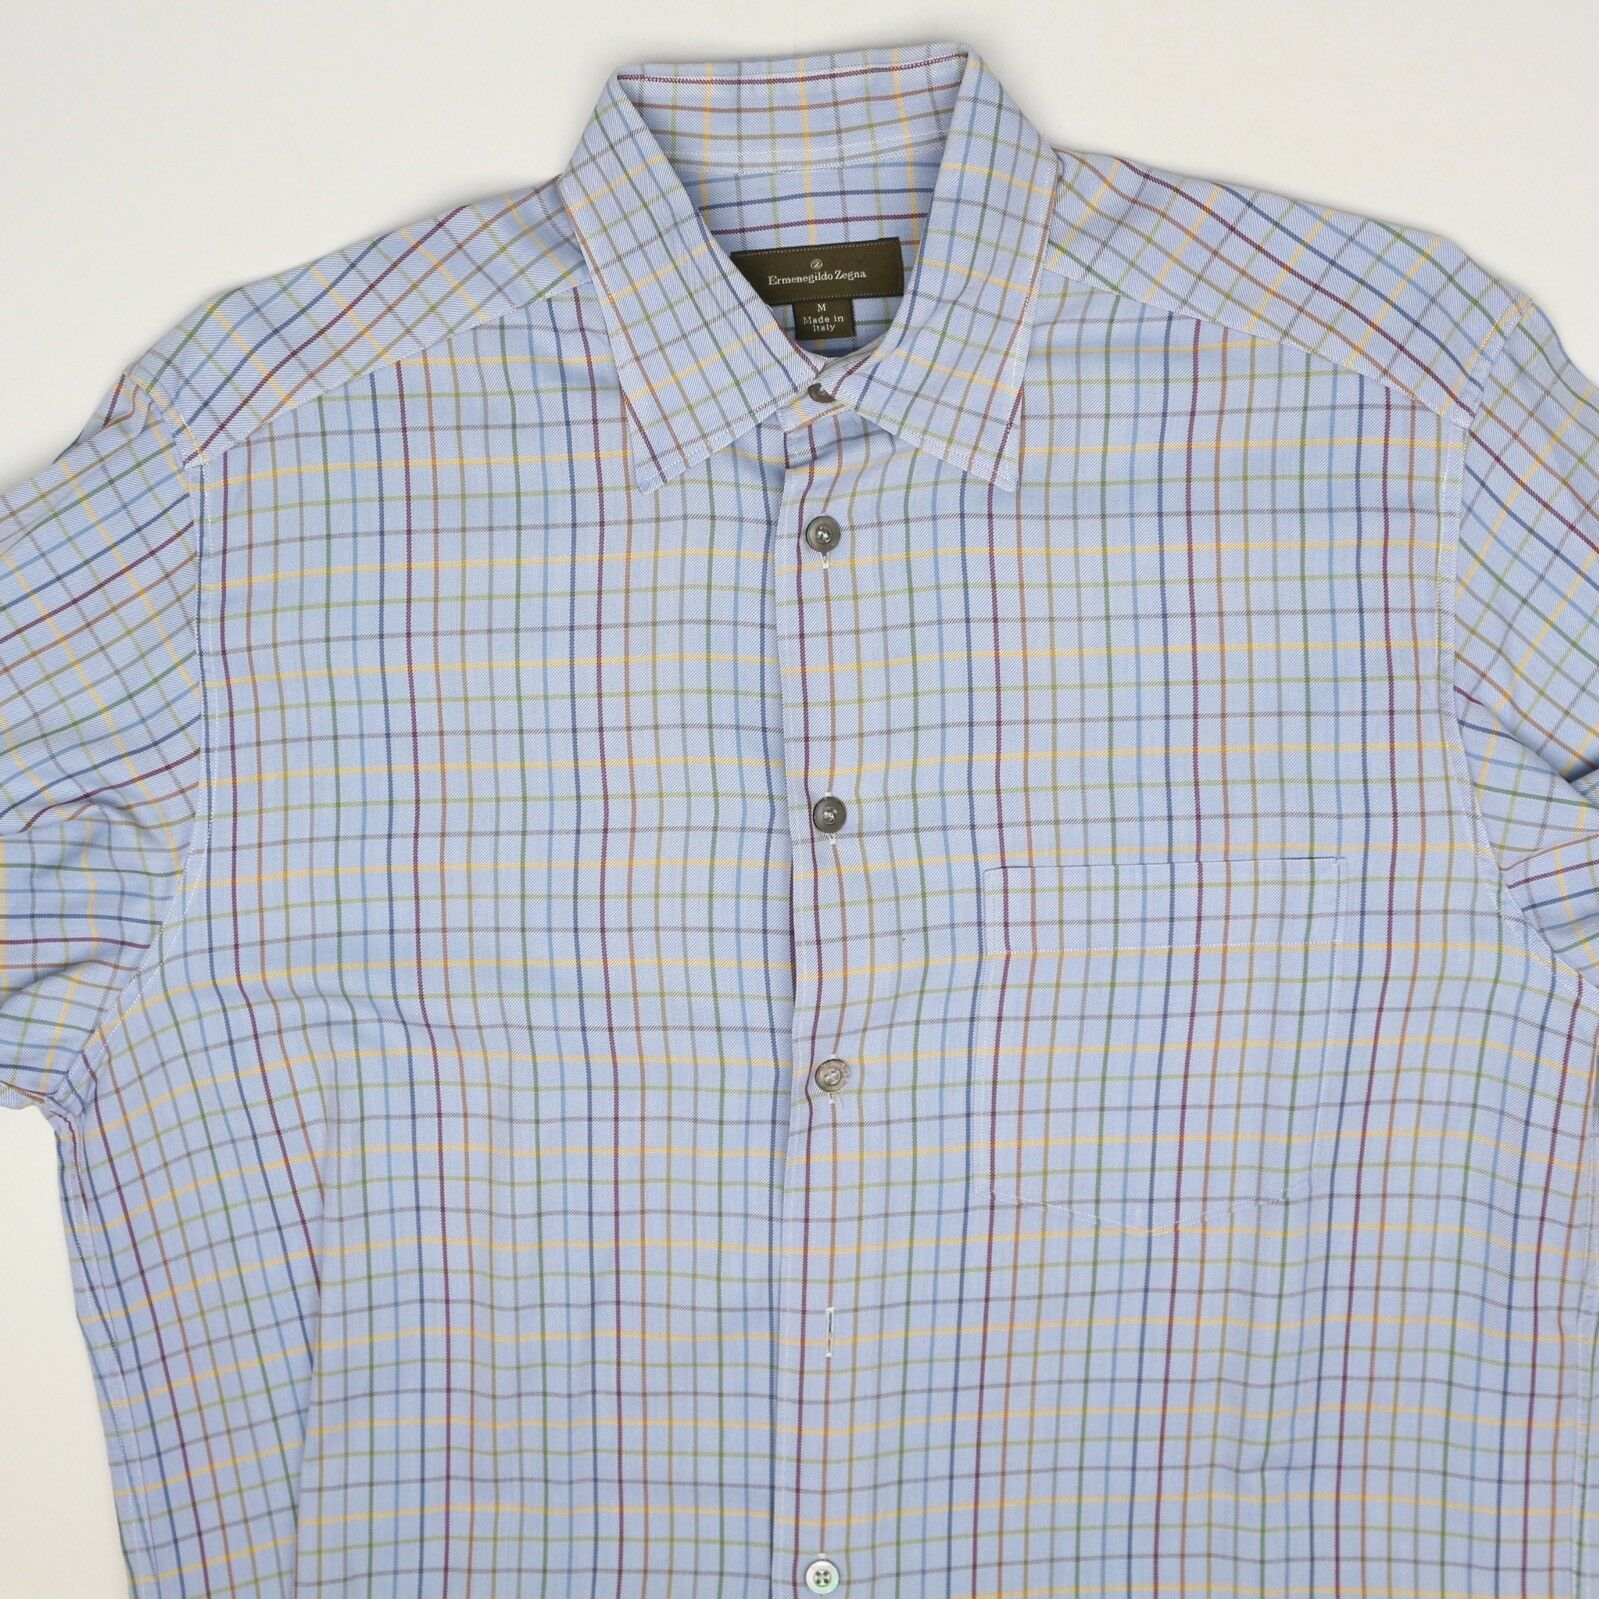 Ermenegildo Zegna Herren Shirt M Blau Mehrfarbig Karo Knopfverschluss  Bund